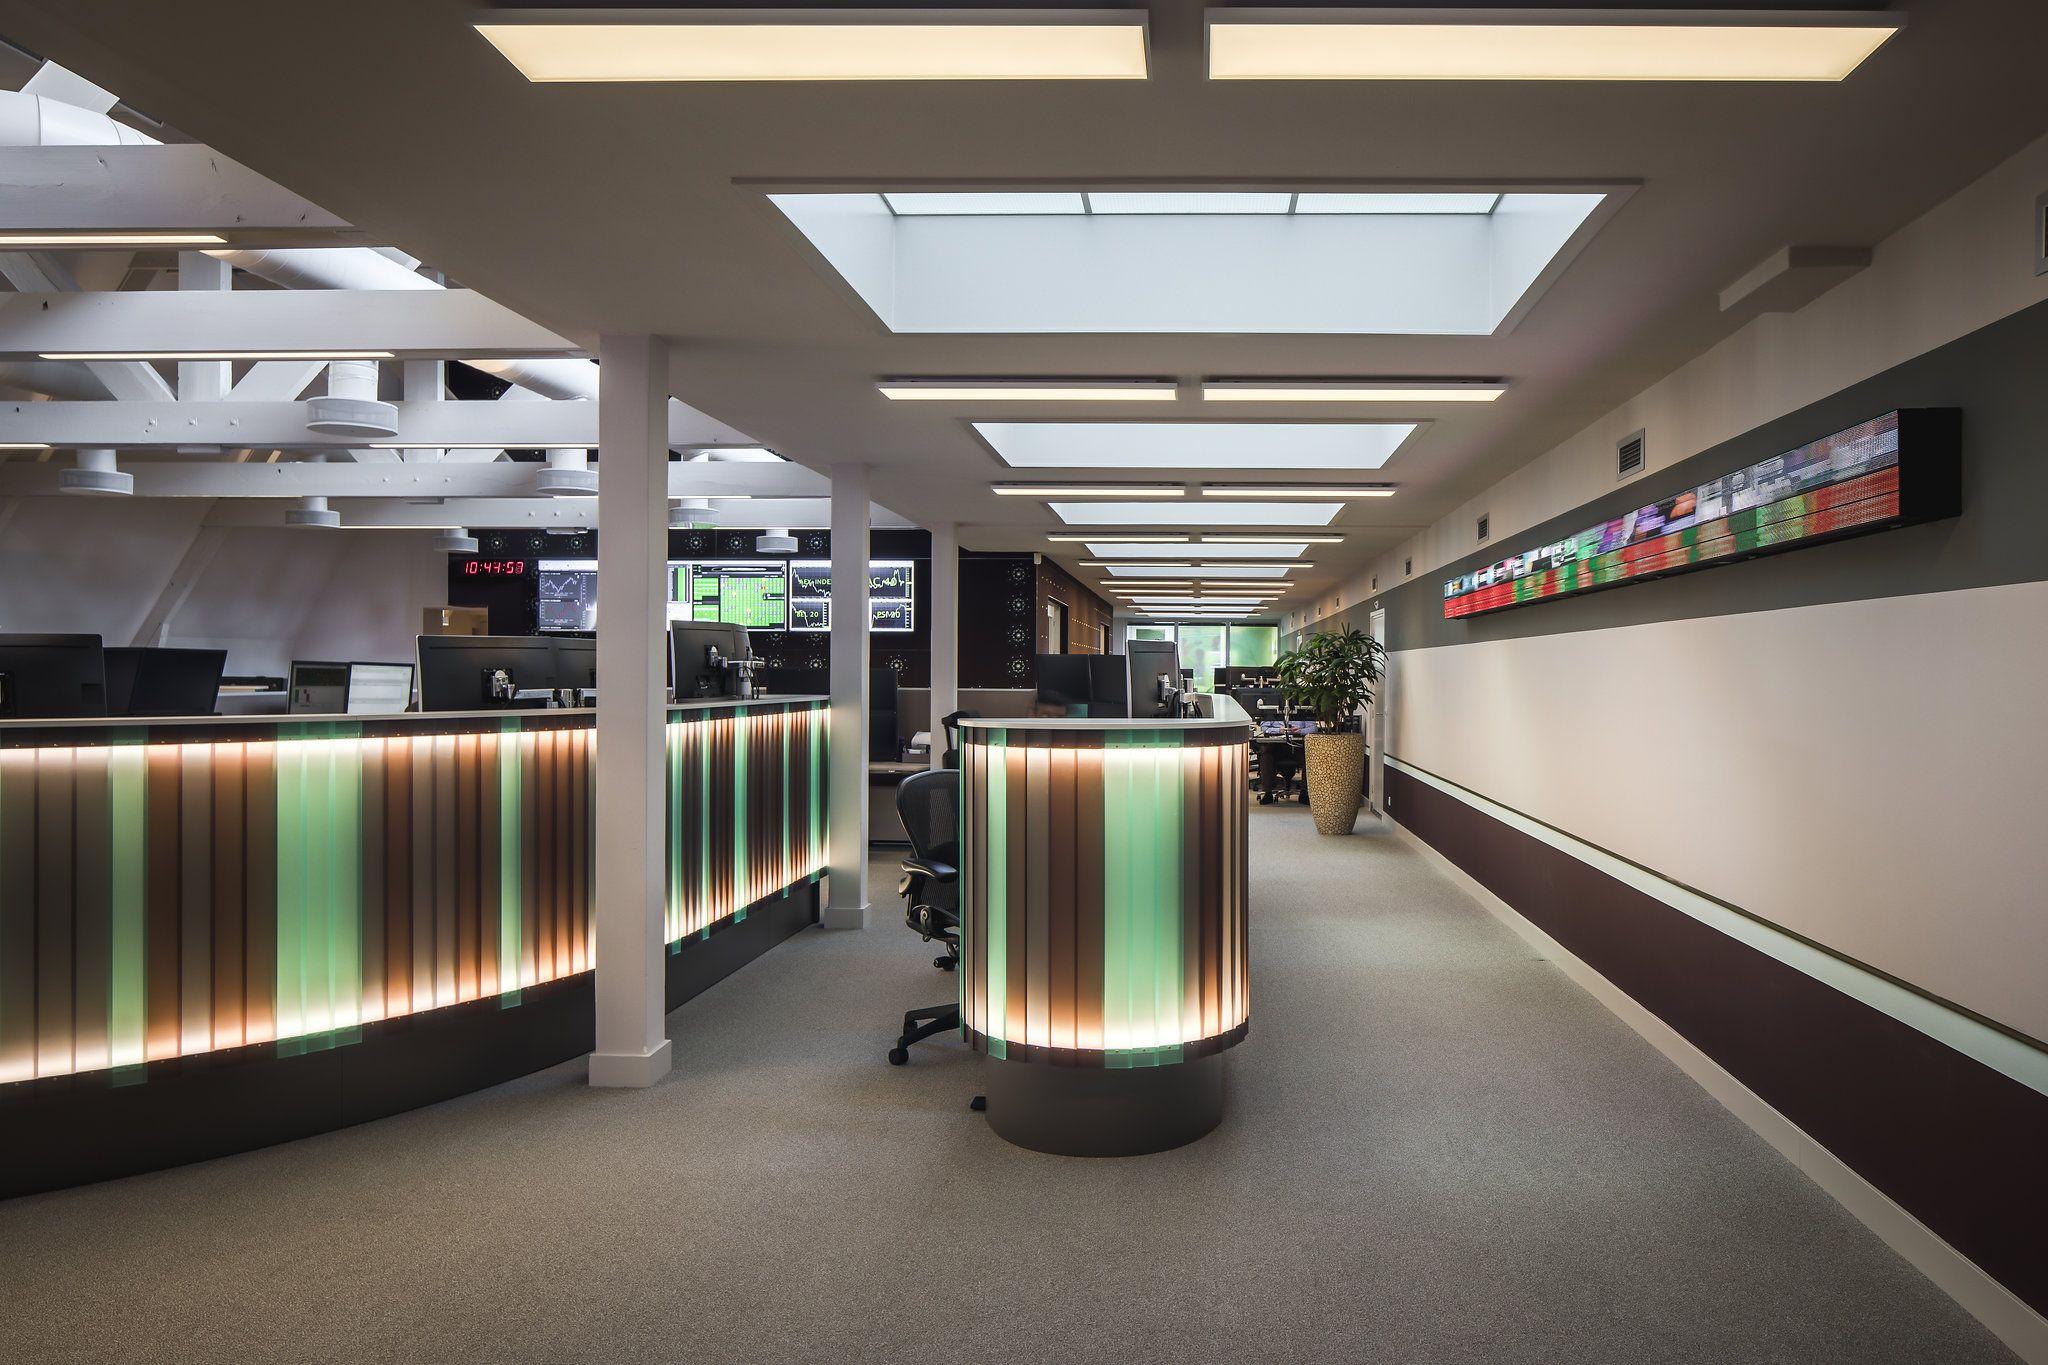 Derksdenboer interior architecture made office for euronext